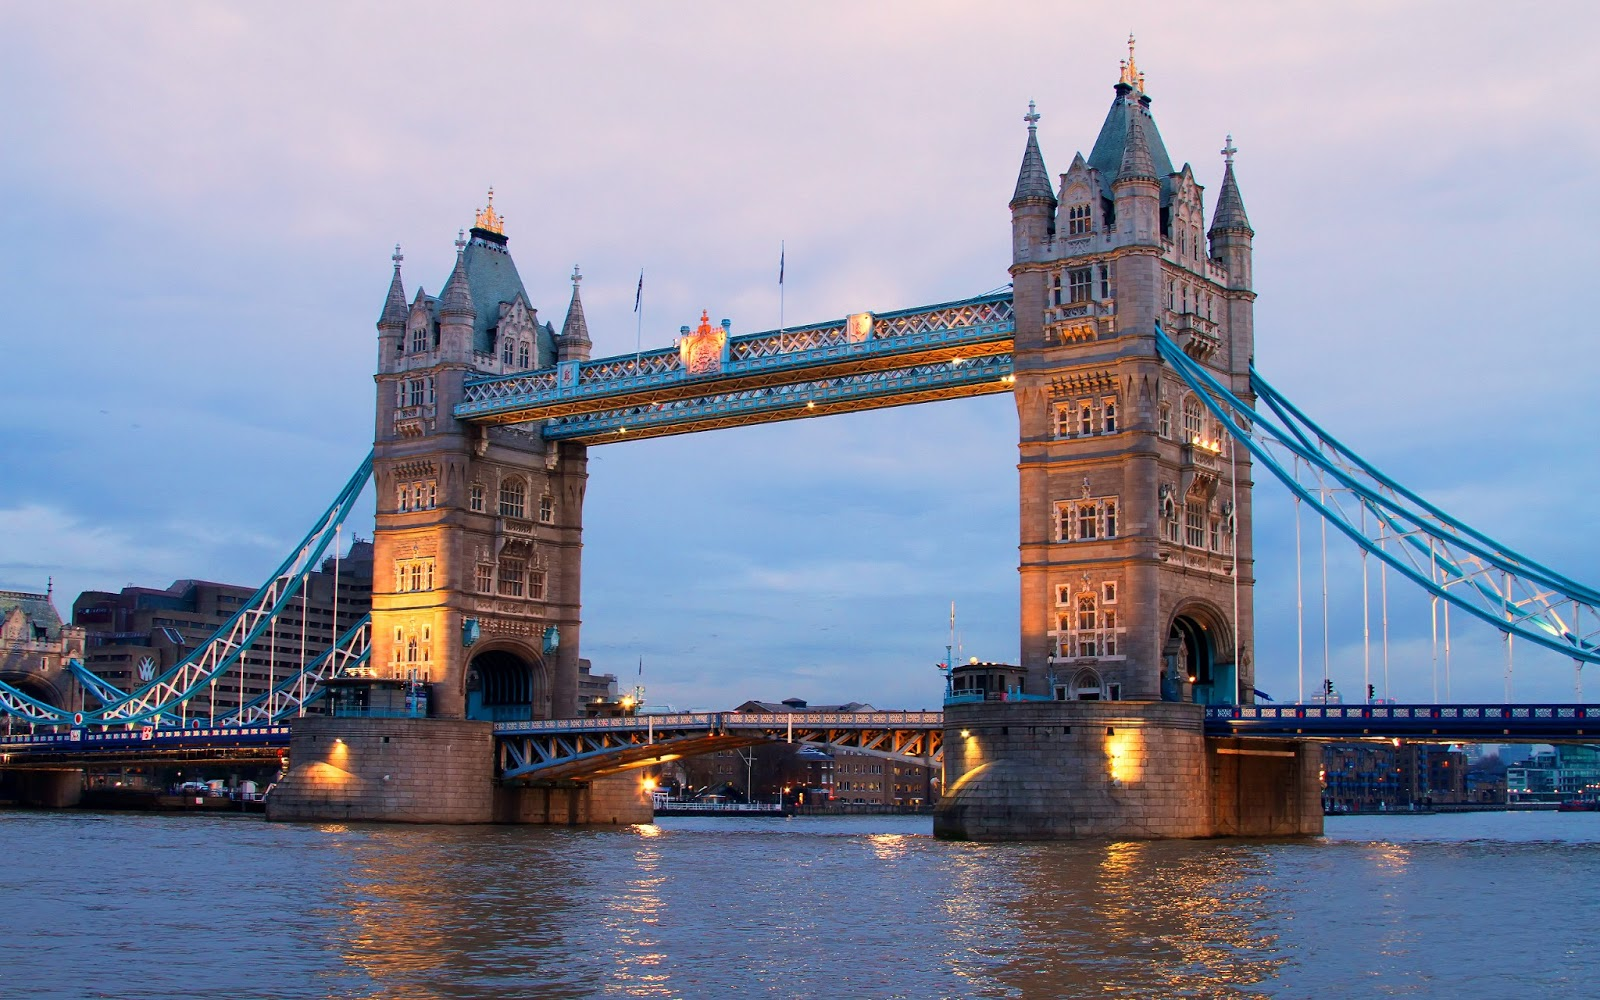 tower bridge of london hq full hd wallpapers download 2013 Fine 1600x1000